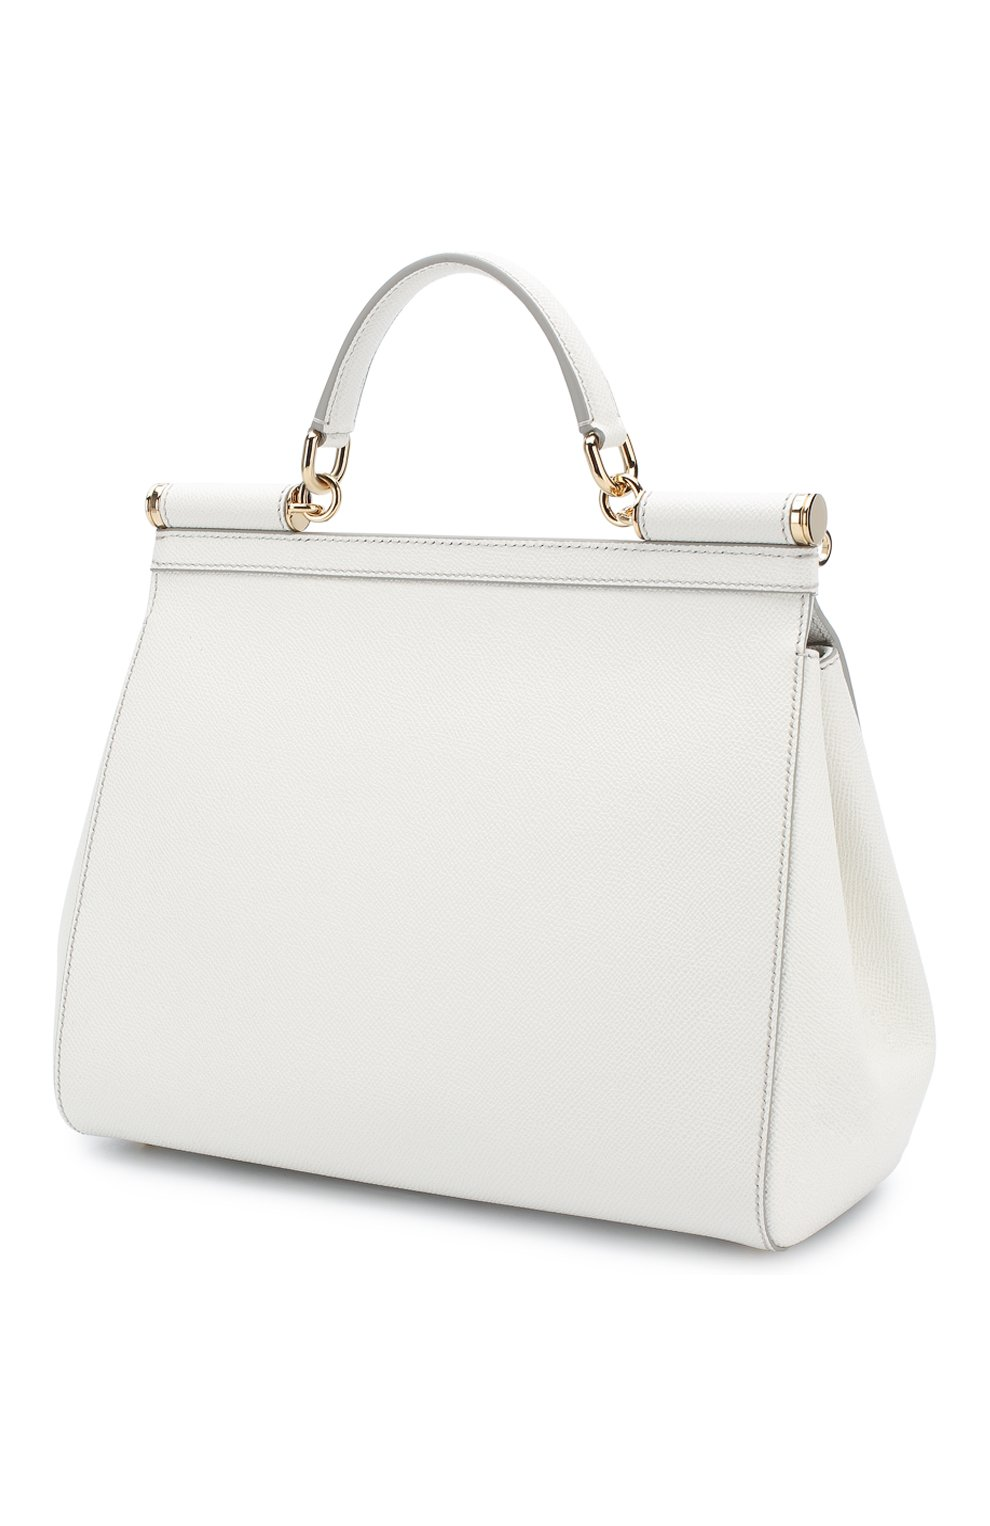 Сумка Sicily medium new Dolce & Gabbana белая цвета | Фото №3